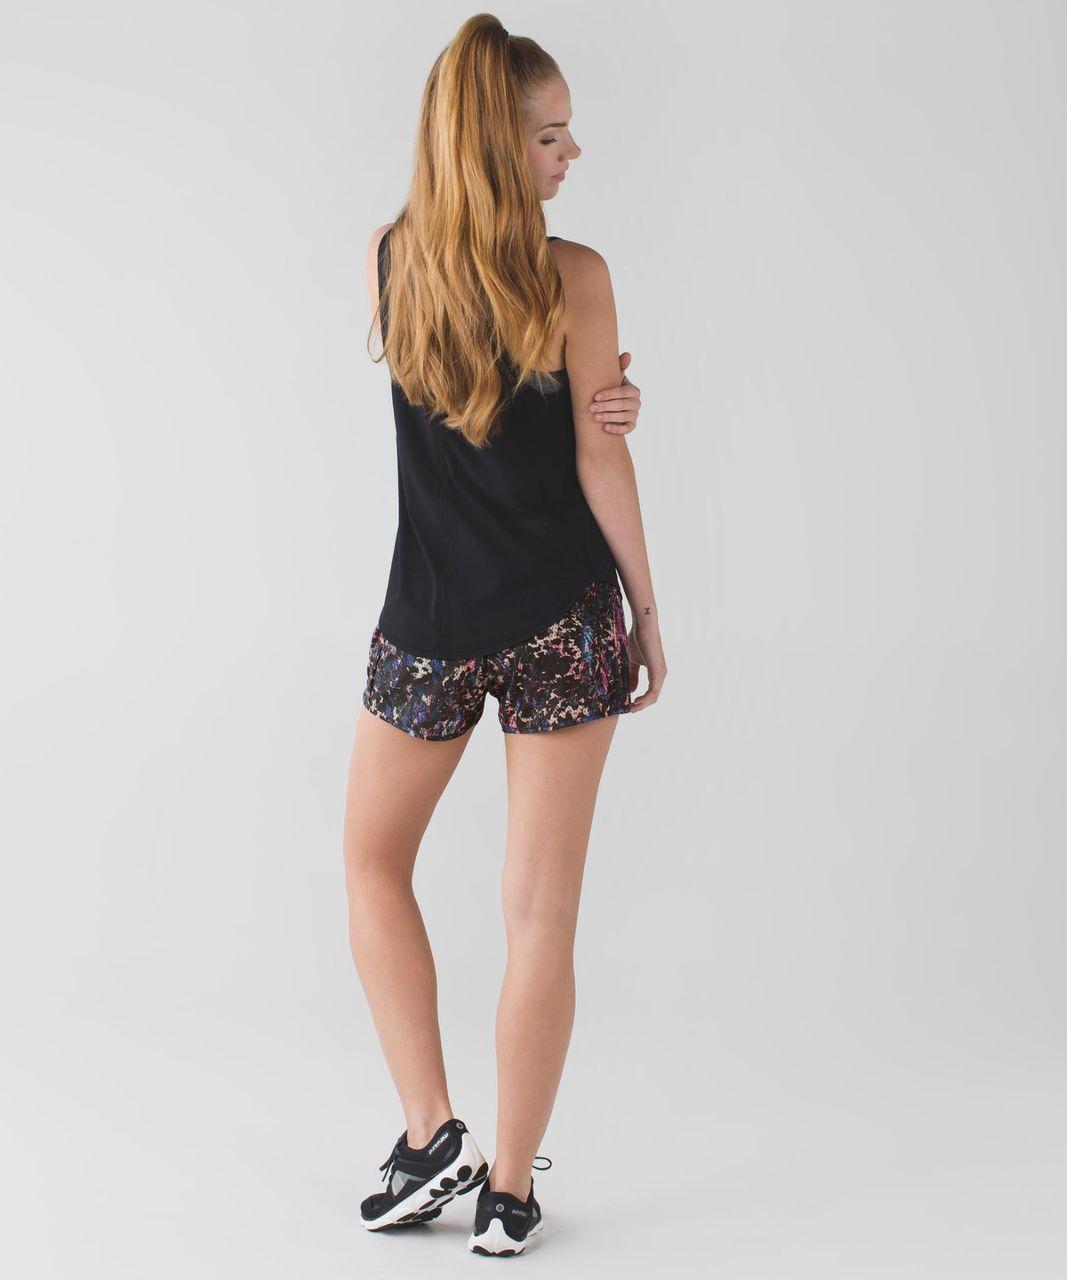 Lululemon Run Times Short *4-way Stretch - Floral Sport Black Multi / Black